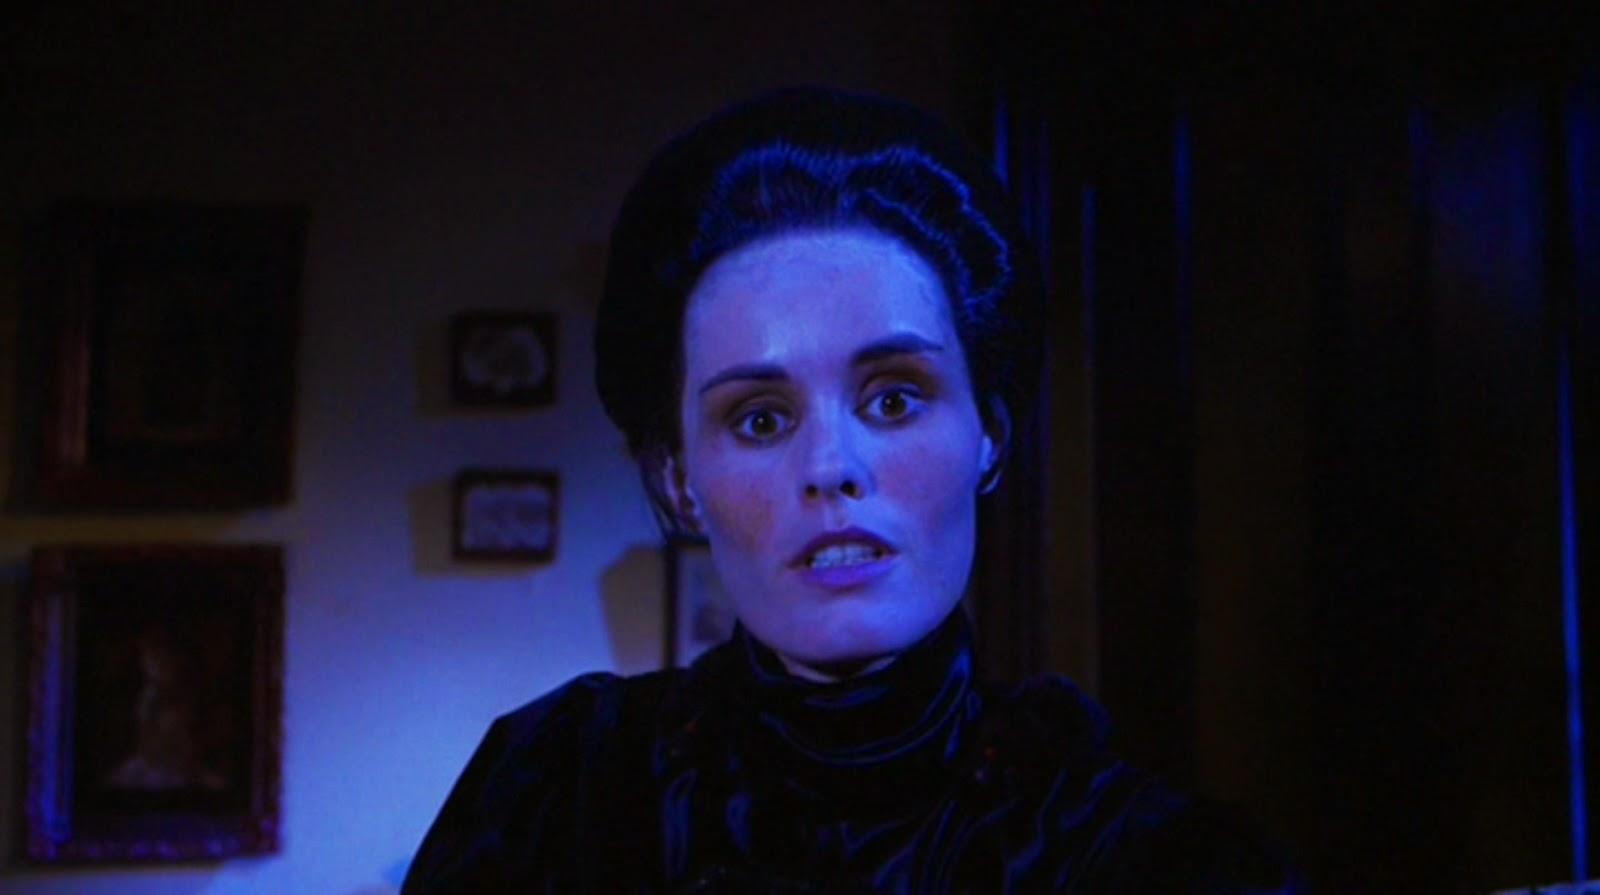 Lesley Gilb as the vampire Lemora in Lemora: A Child's Tale of the Supernatural (1973)